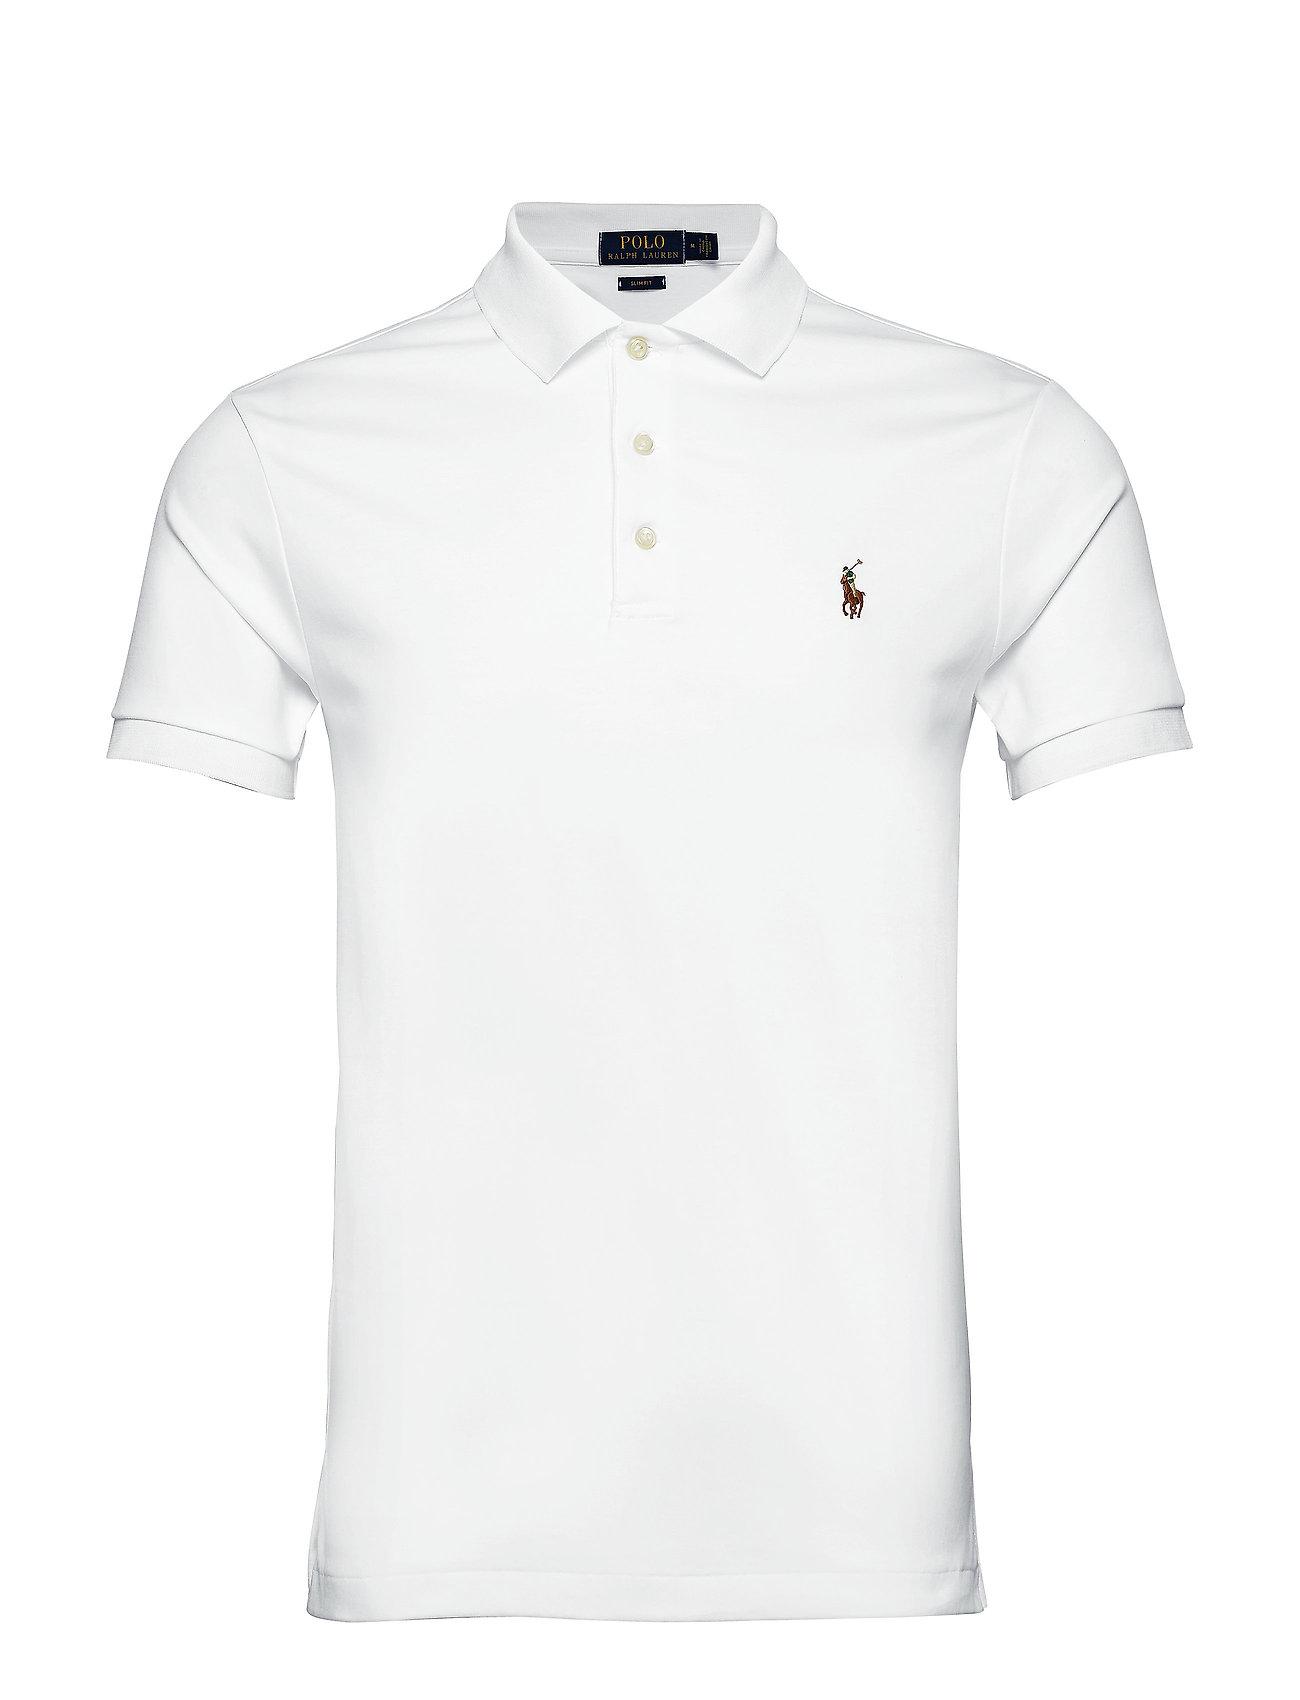 Polo Ralph Lauren Slim Fit Soft-Touch Polo Shirt - WHITE